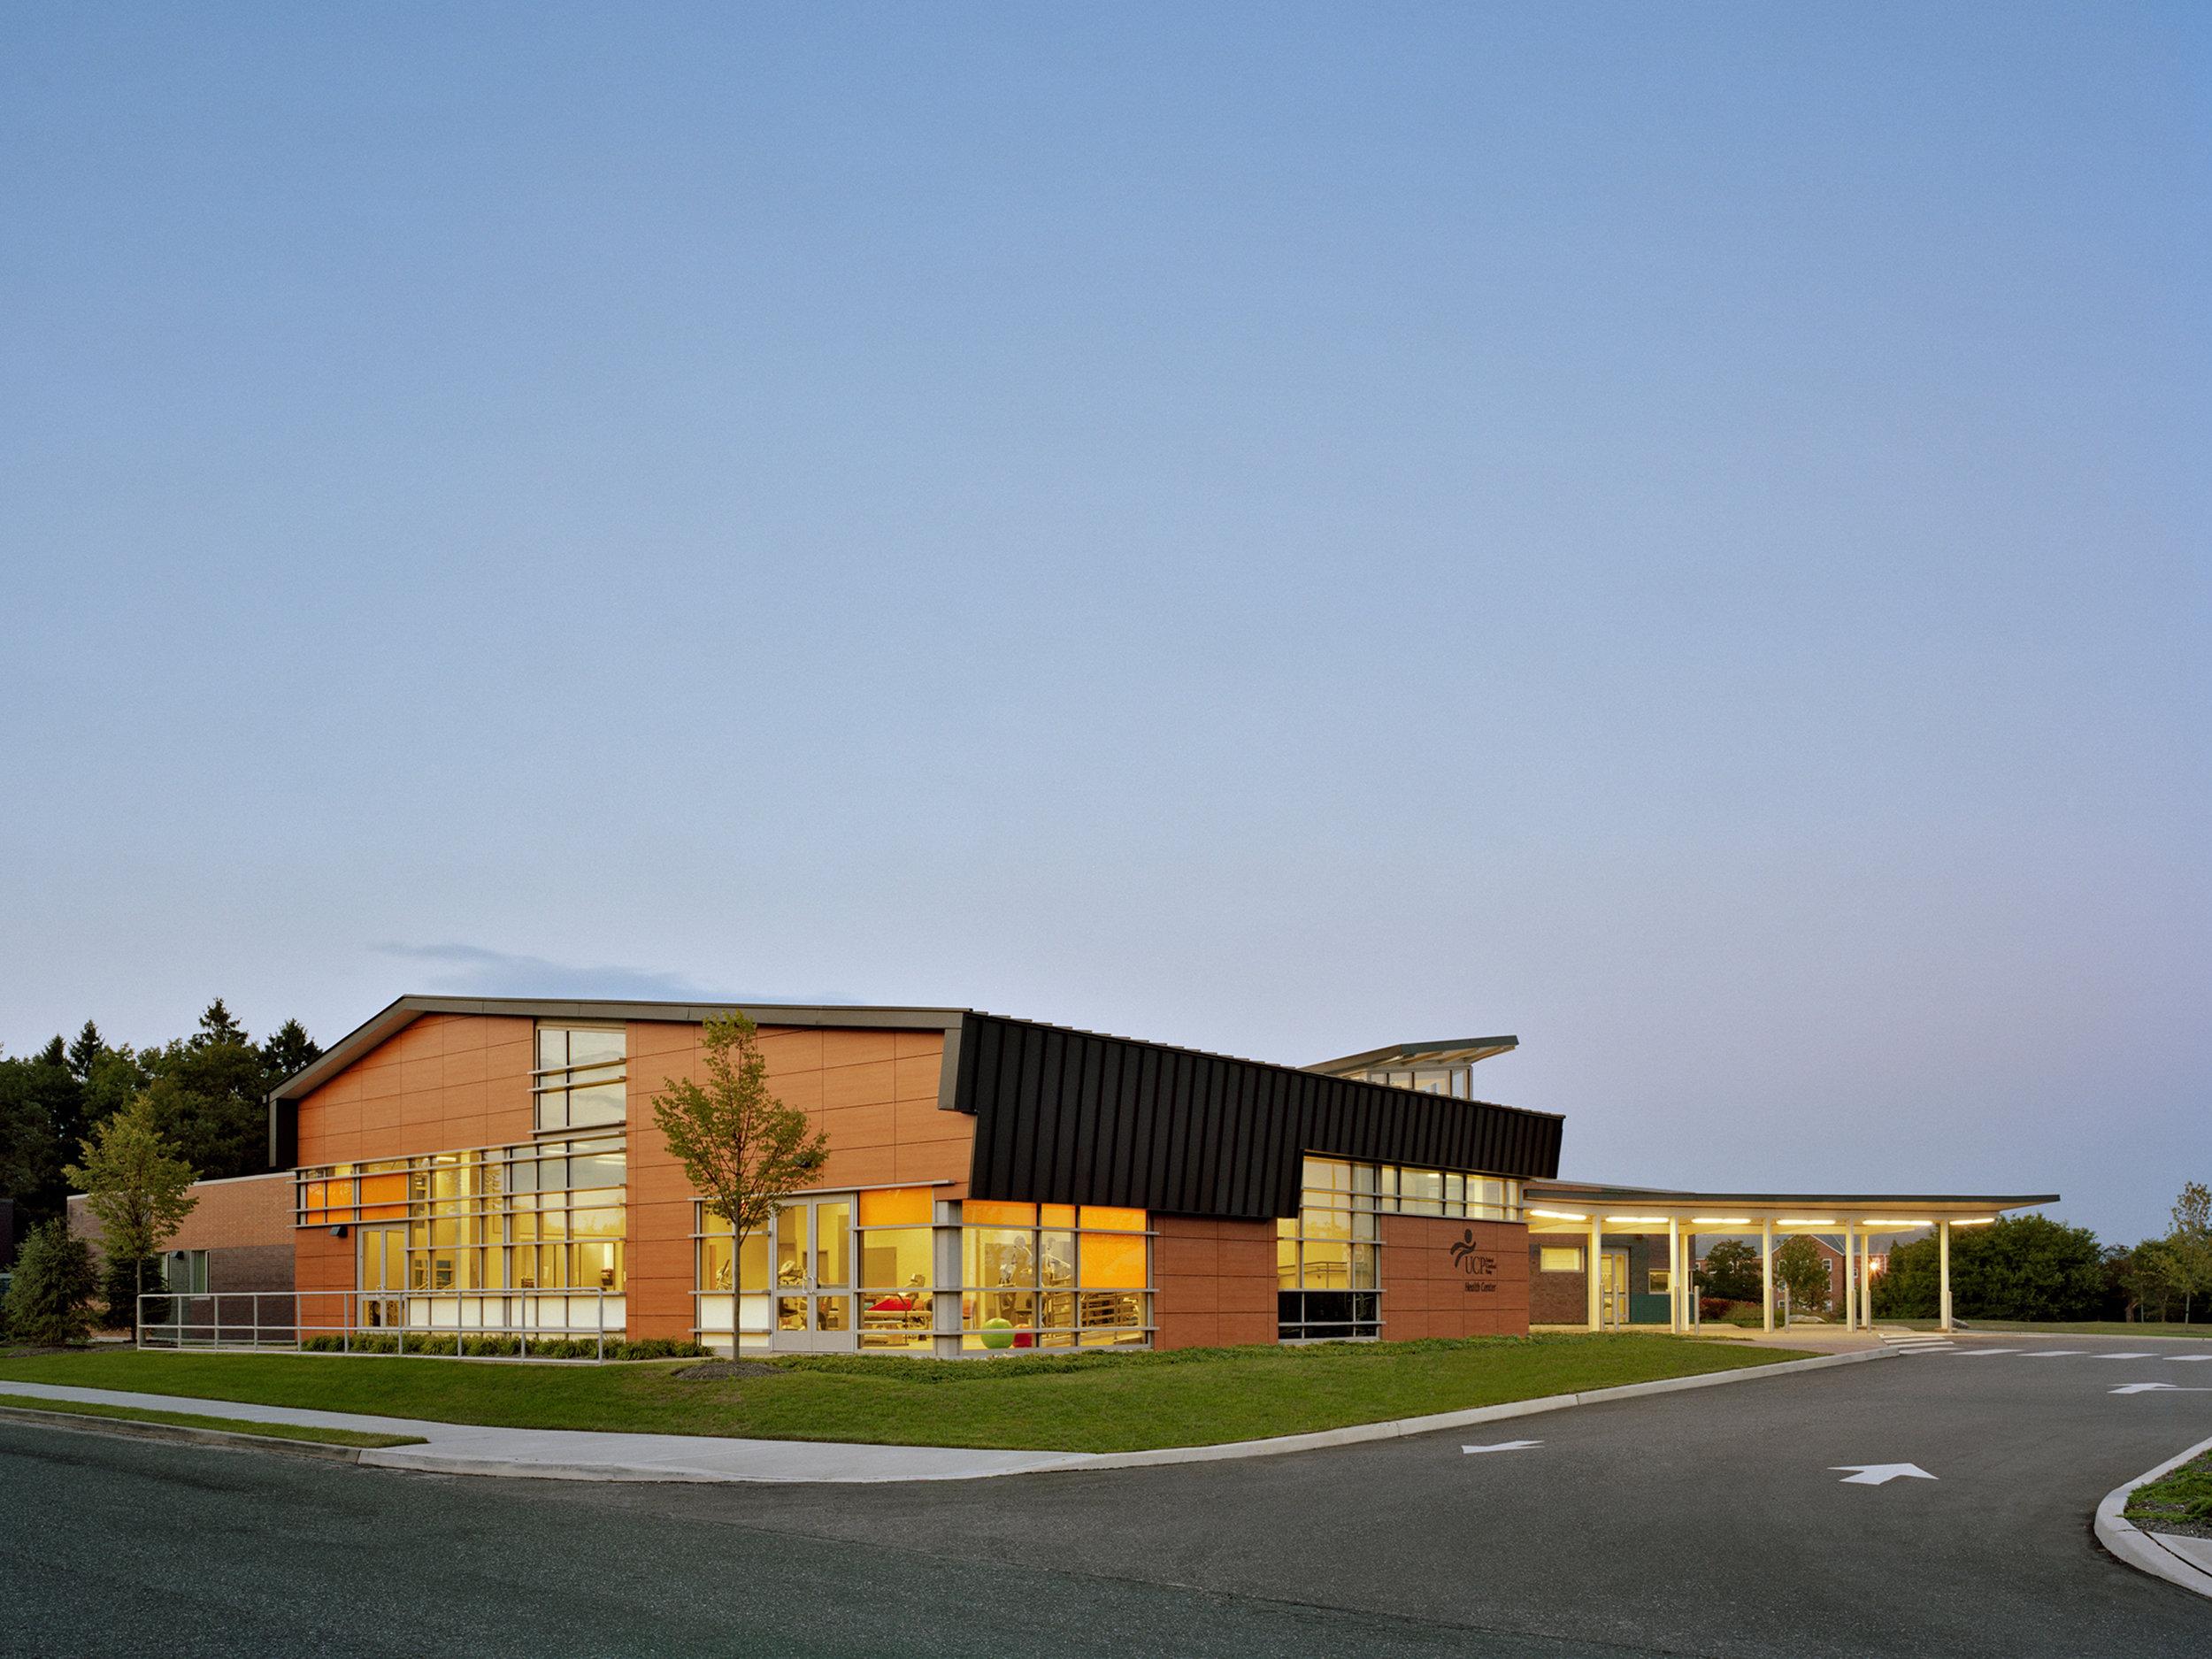 UCP HEALTH CENTER